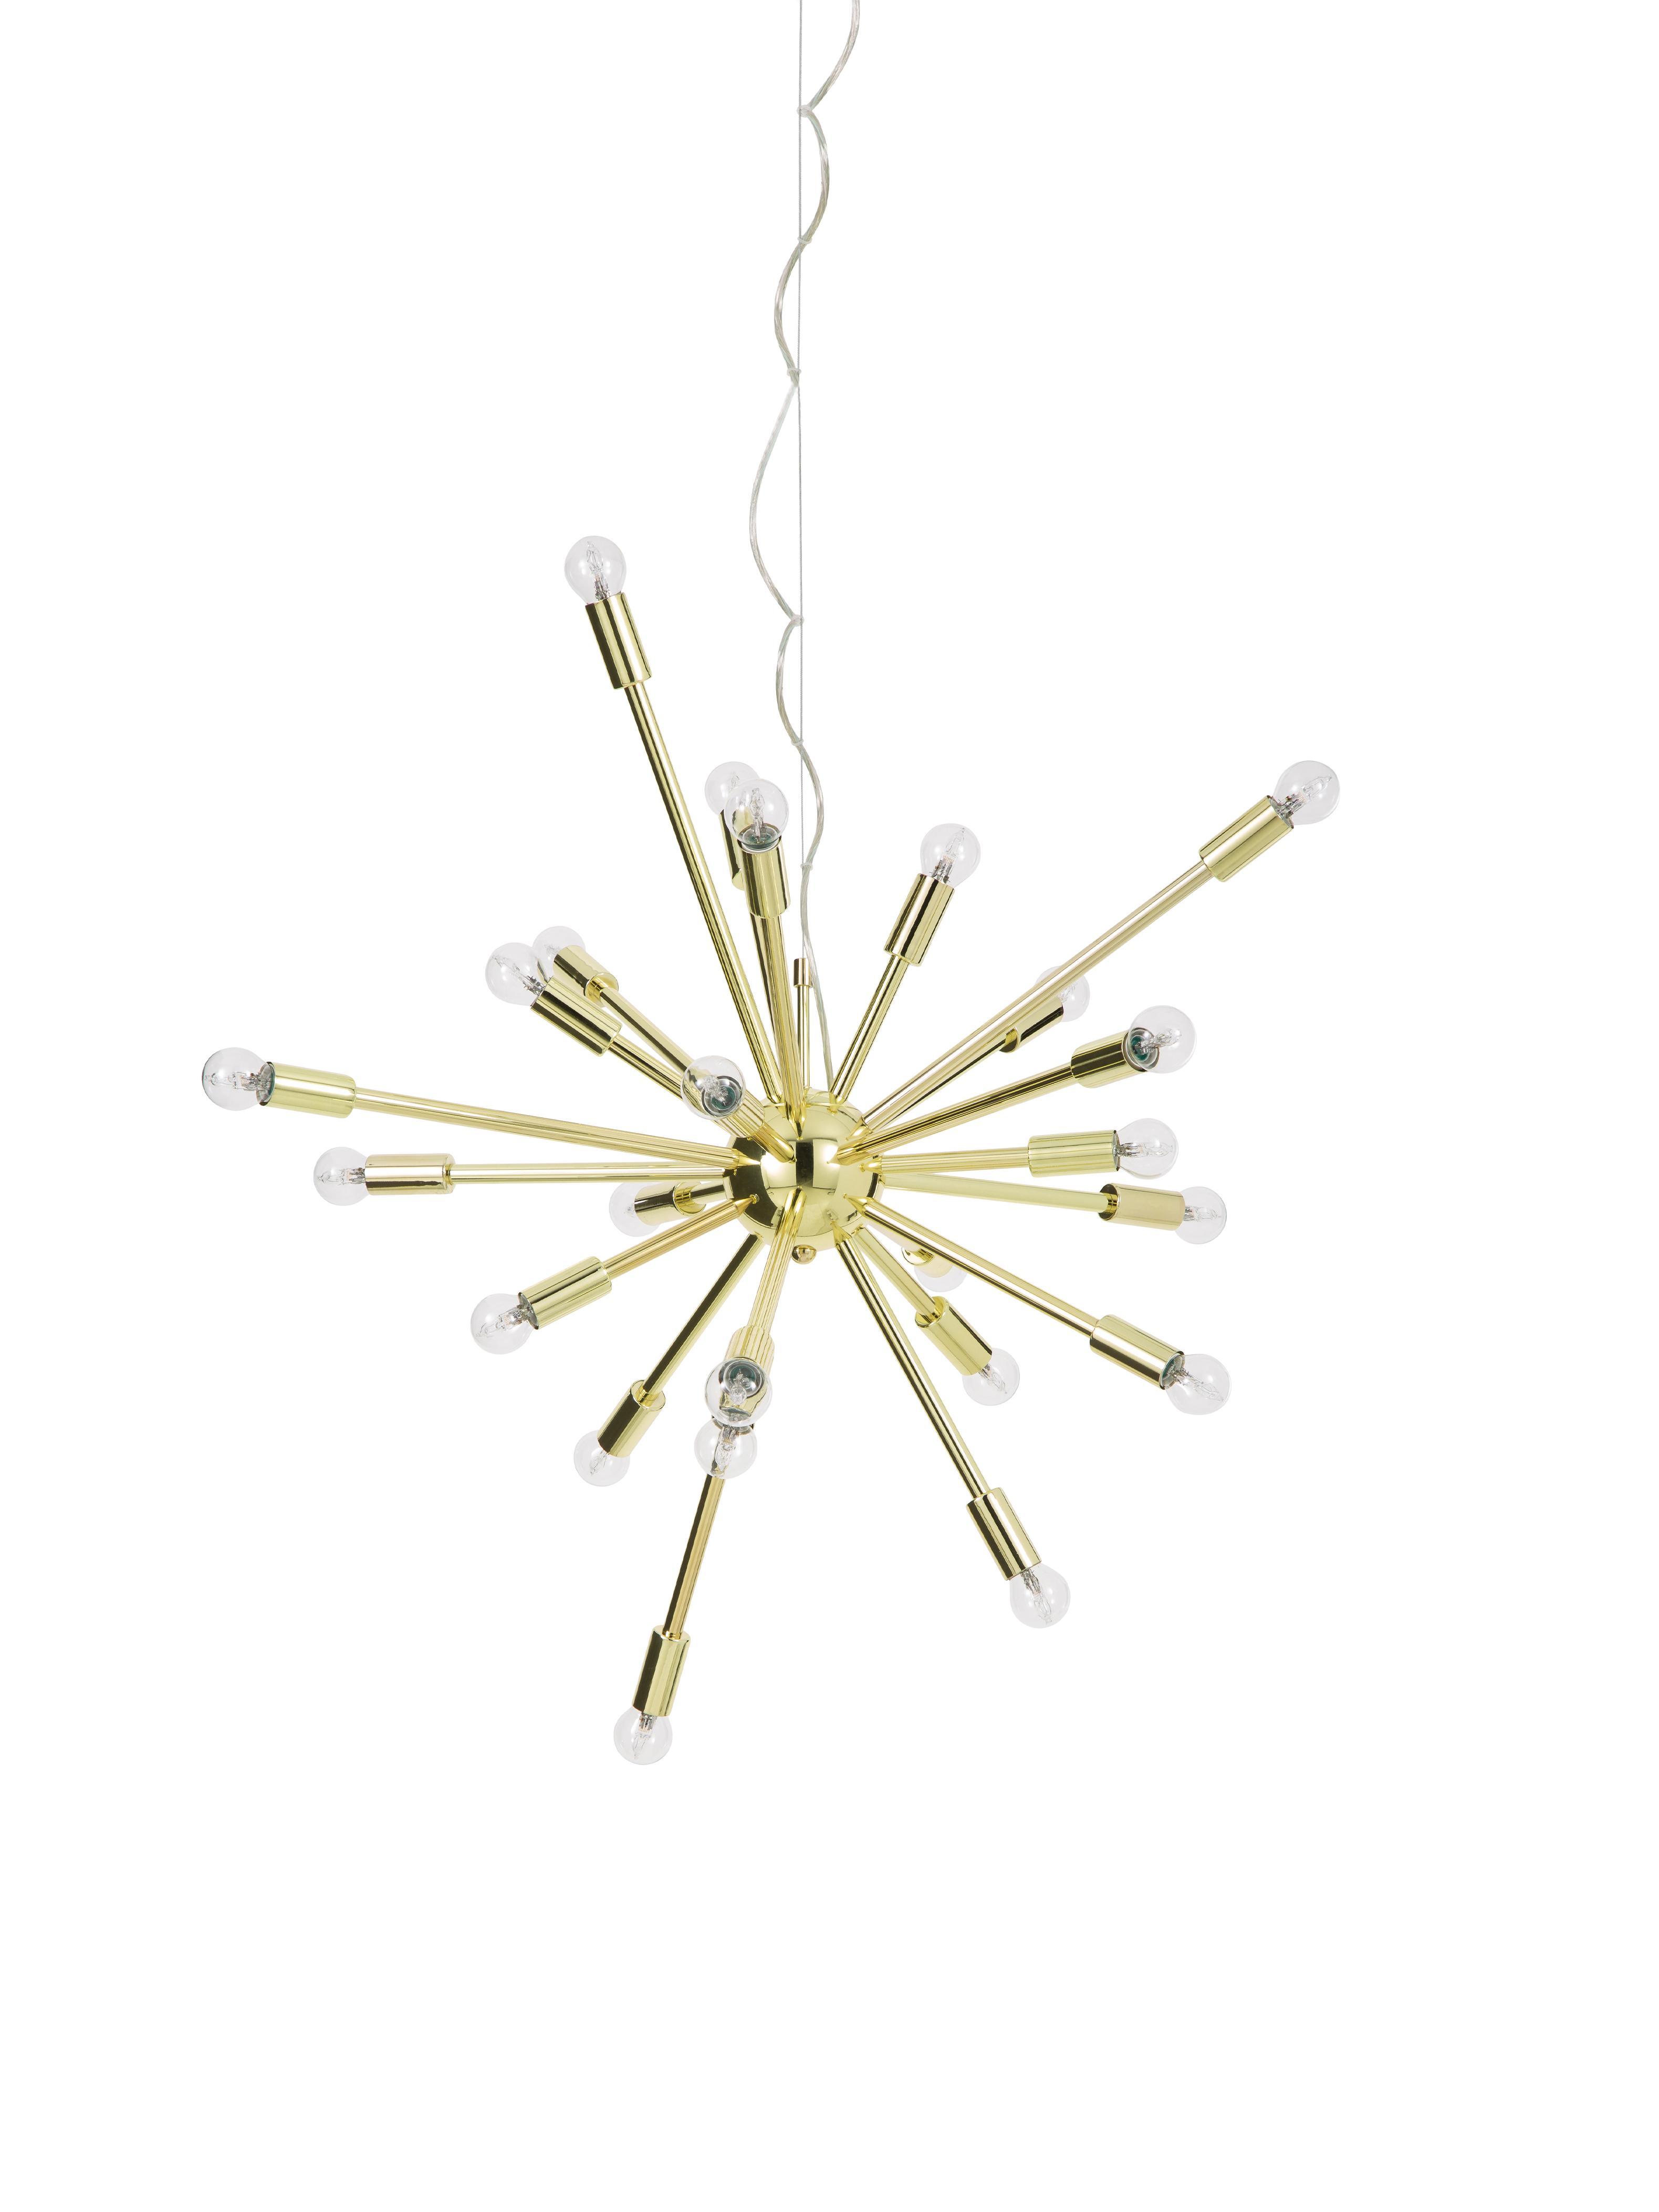 Grote hanglamp Spike goudkleurig, Baldakijn: metaal, Lampenkap: metaal, Baldakijn: goudkleurig. Lampenkap: goudkleurig. Snoer: transparant, Ø 90 cm